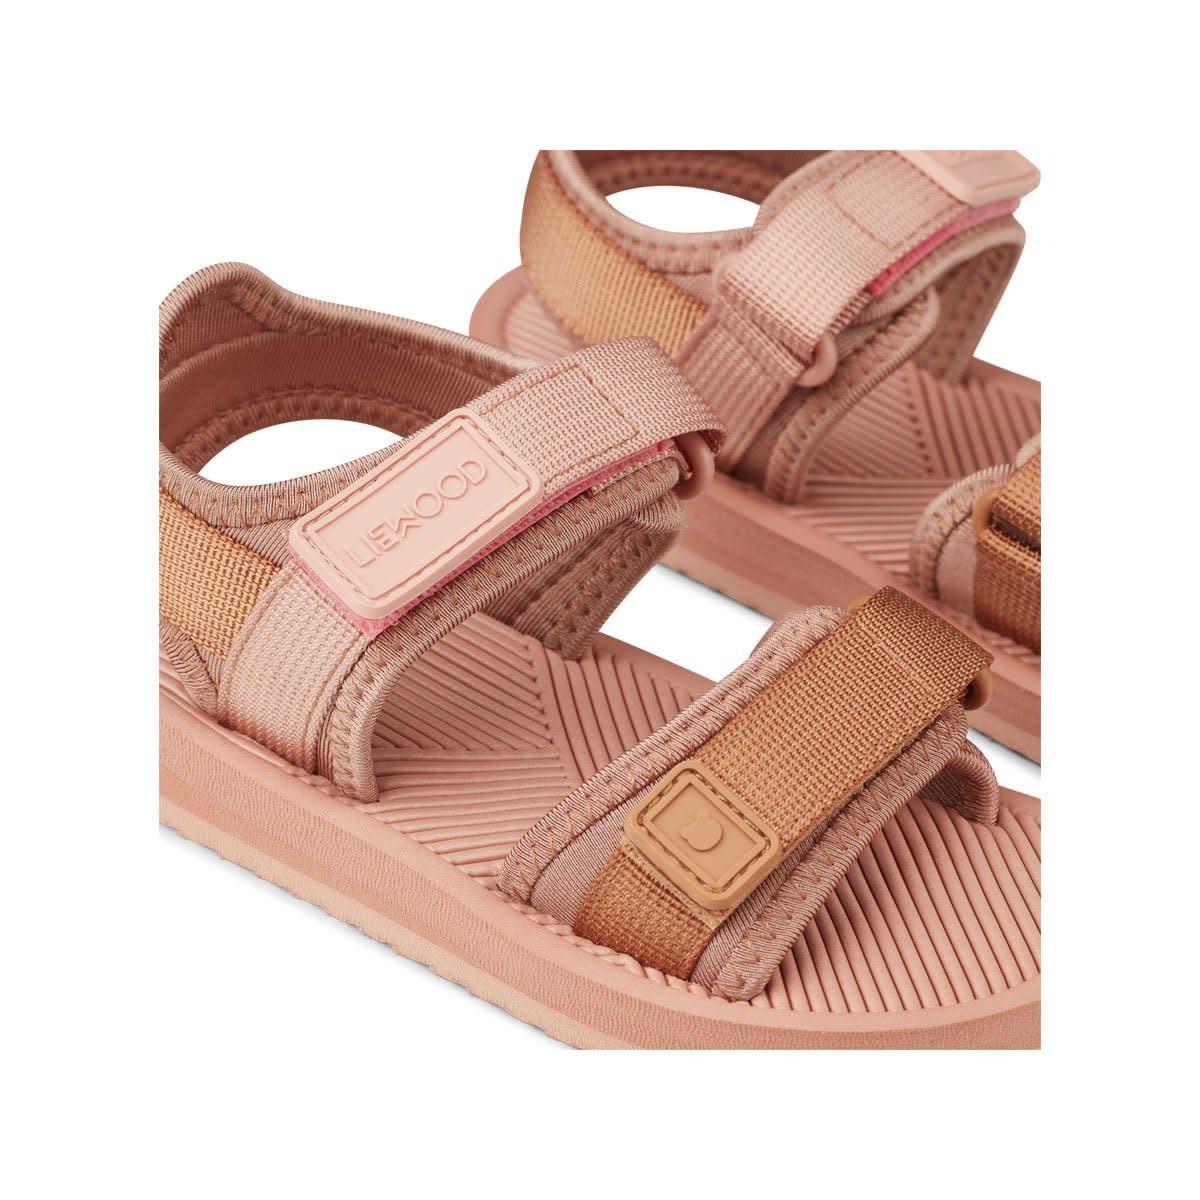 Monty sandals rose mix-3